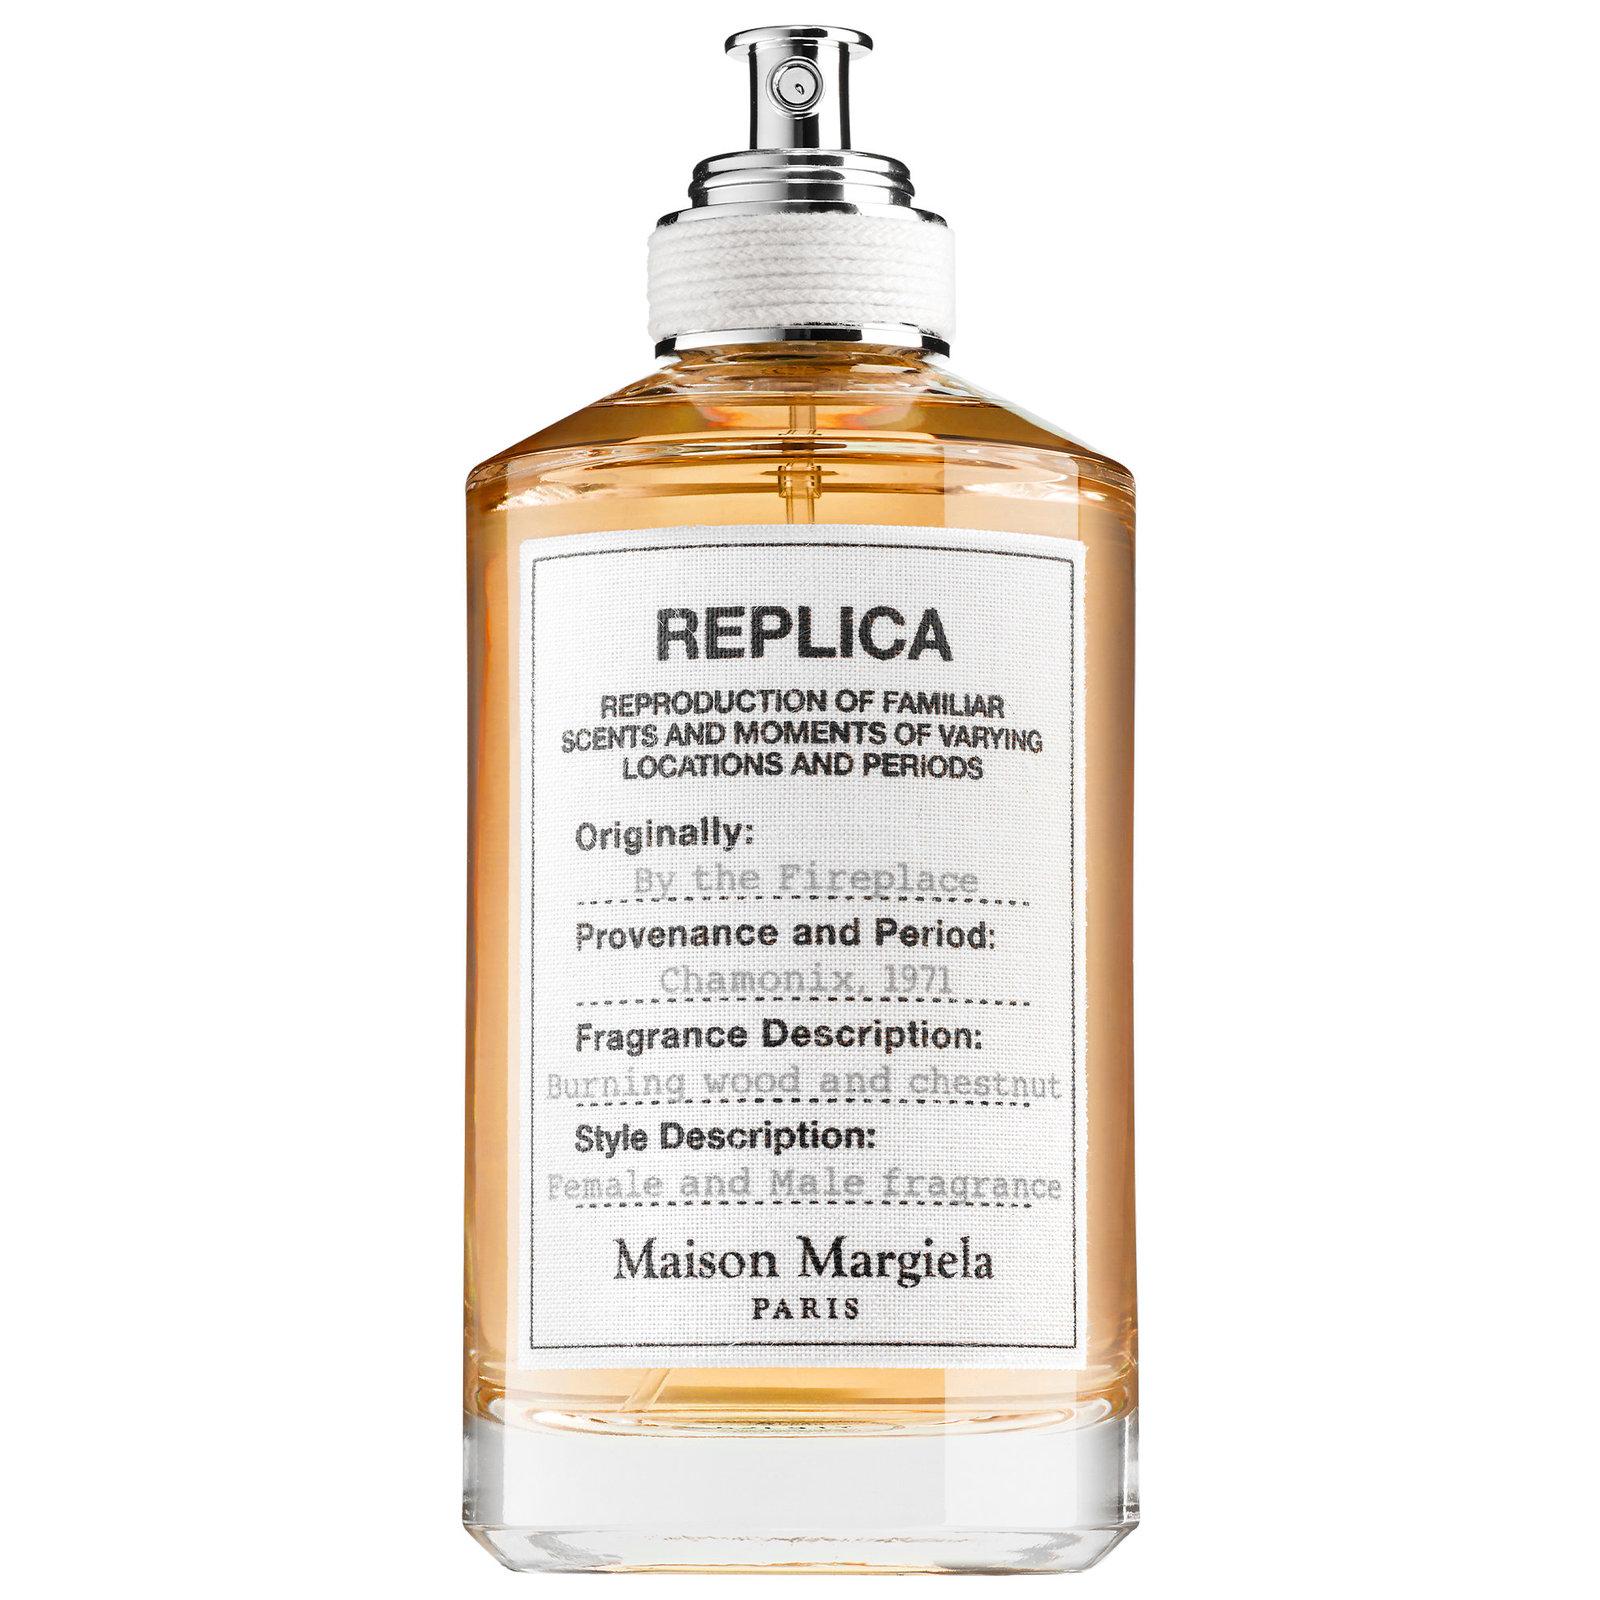 BY THE FIREPLACE by MARTIN MARGIELA 5ml Travel Spray Perfume MMM CHESTNUT